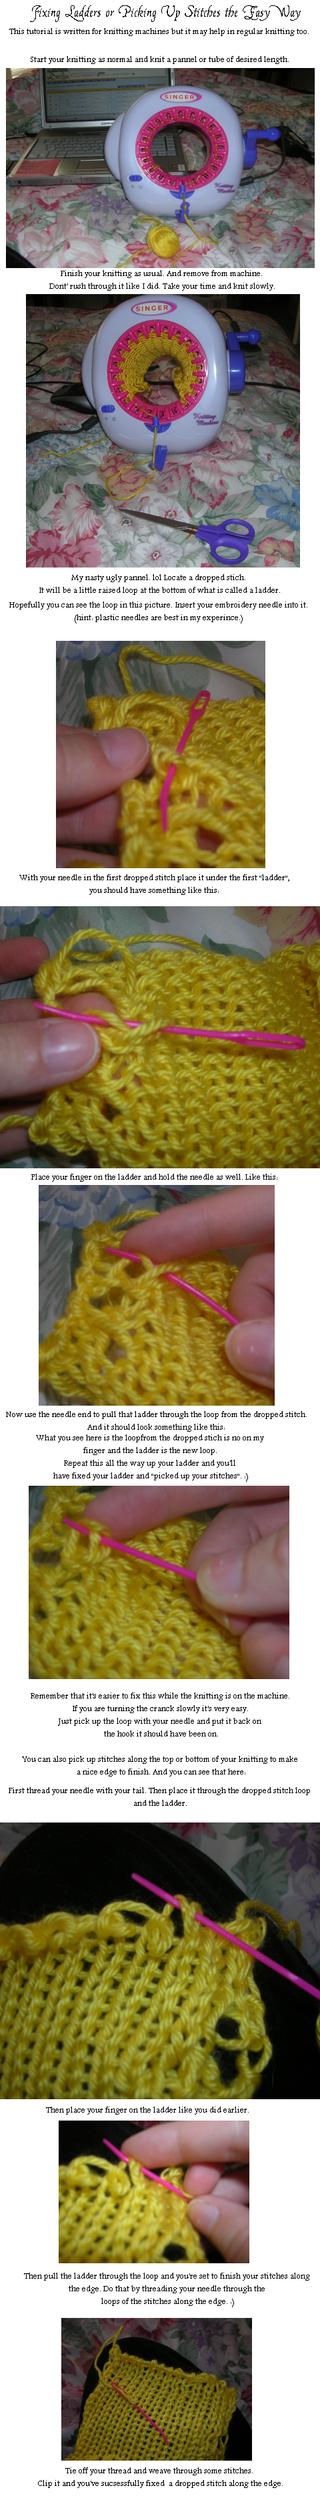 Picking up stitches by Eliea on DeviantArt